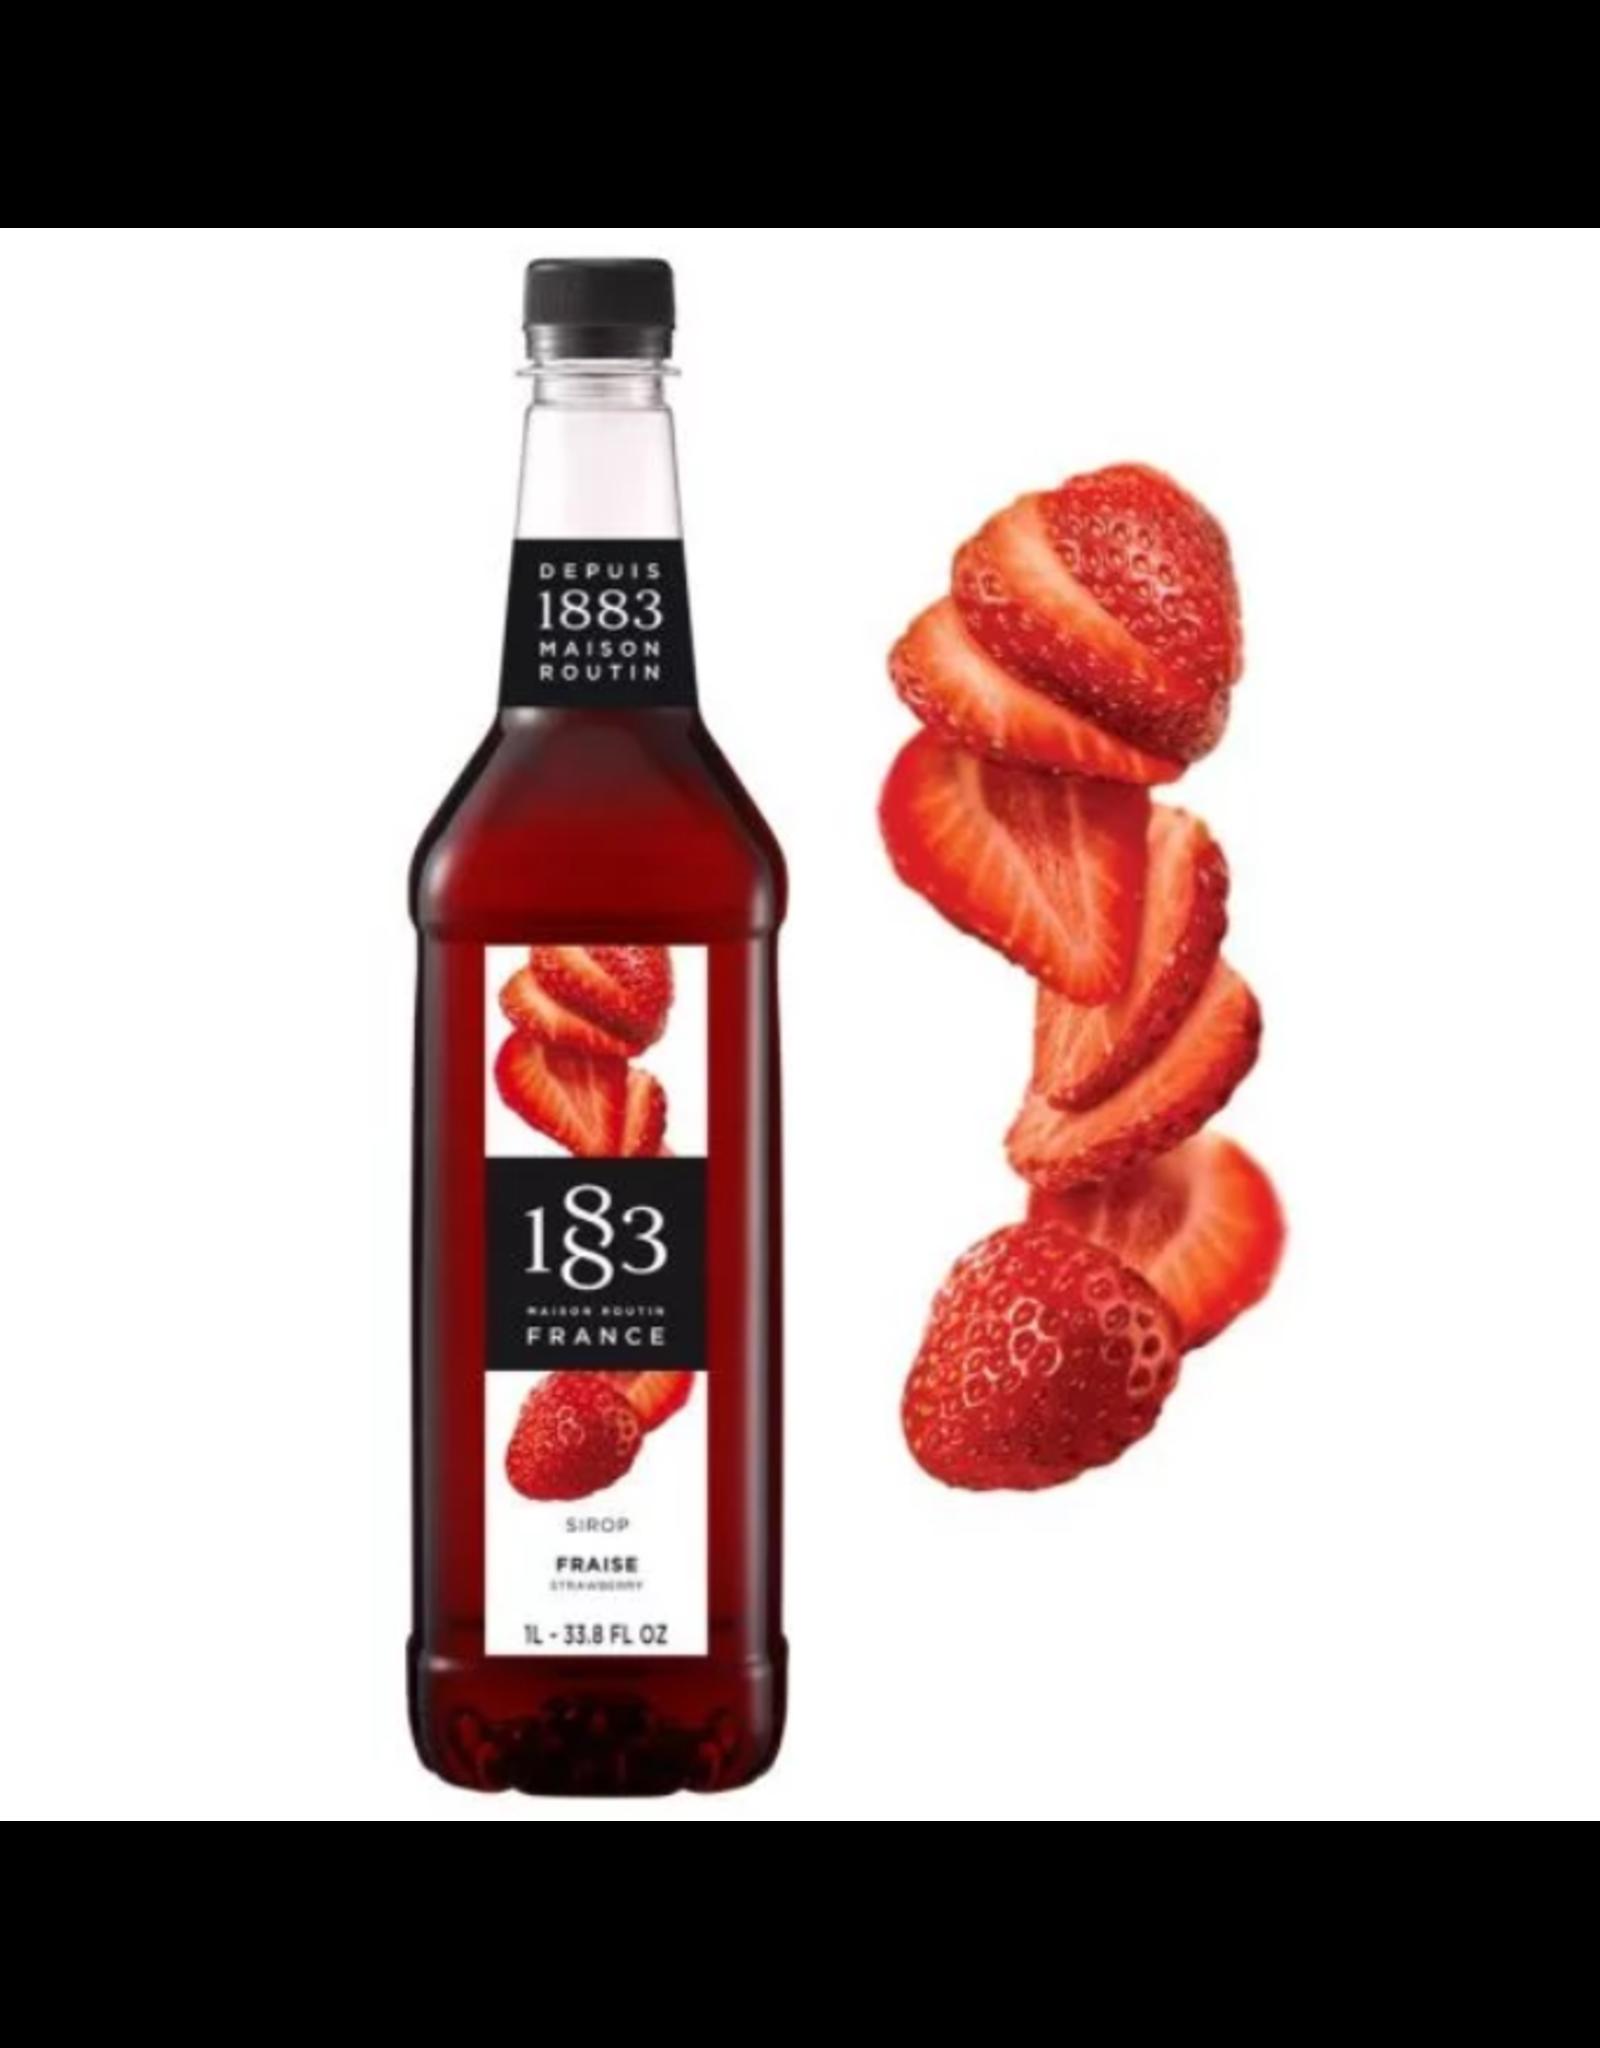 1883 Maison Routin France 1883 Syrup, Strawberry 1L Bottle